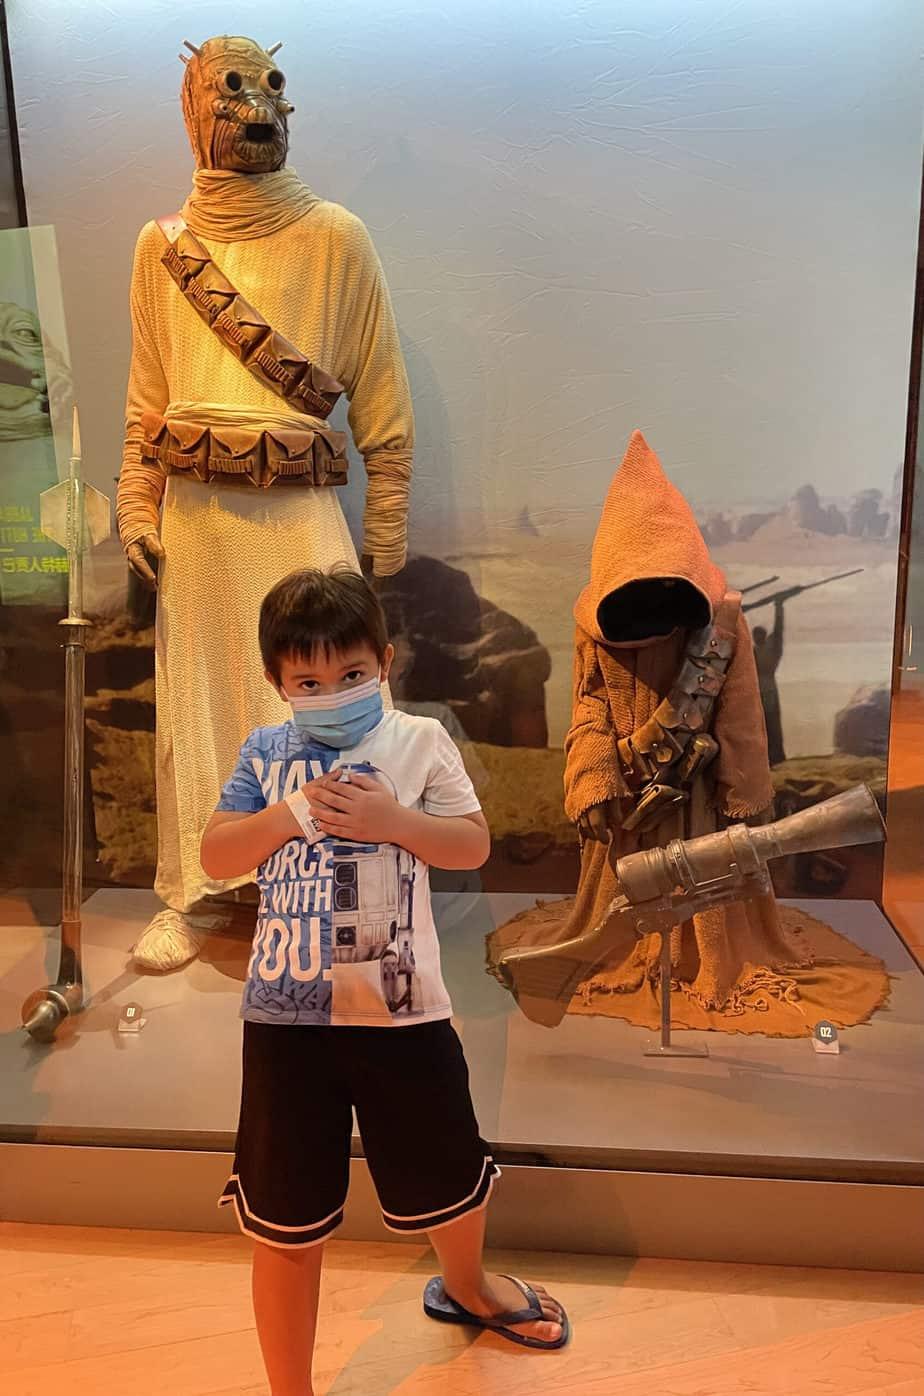 Star Wars Identities @ Art Science Museum